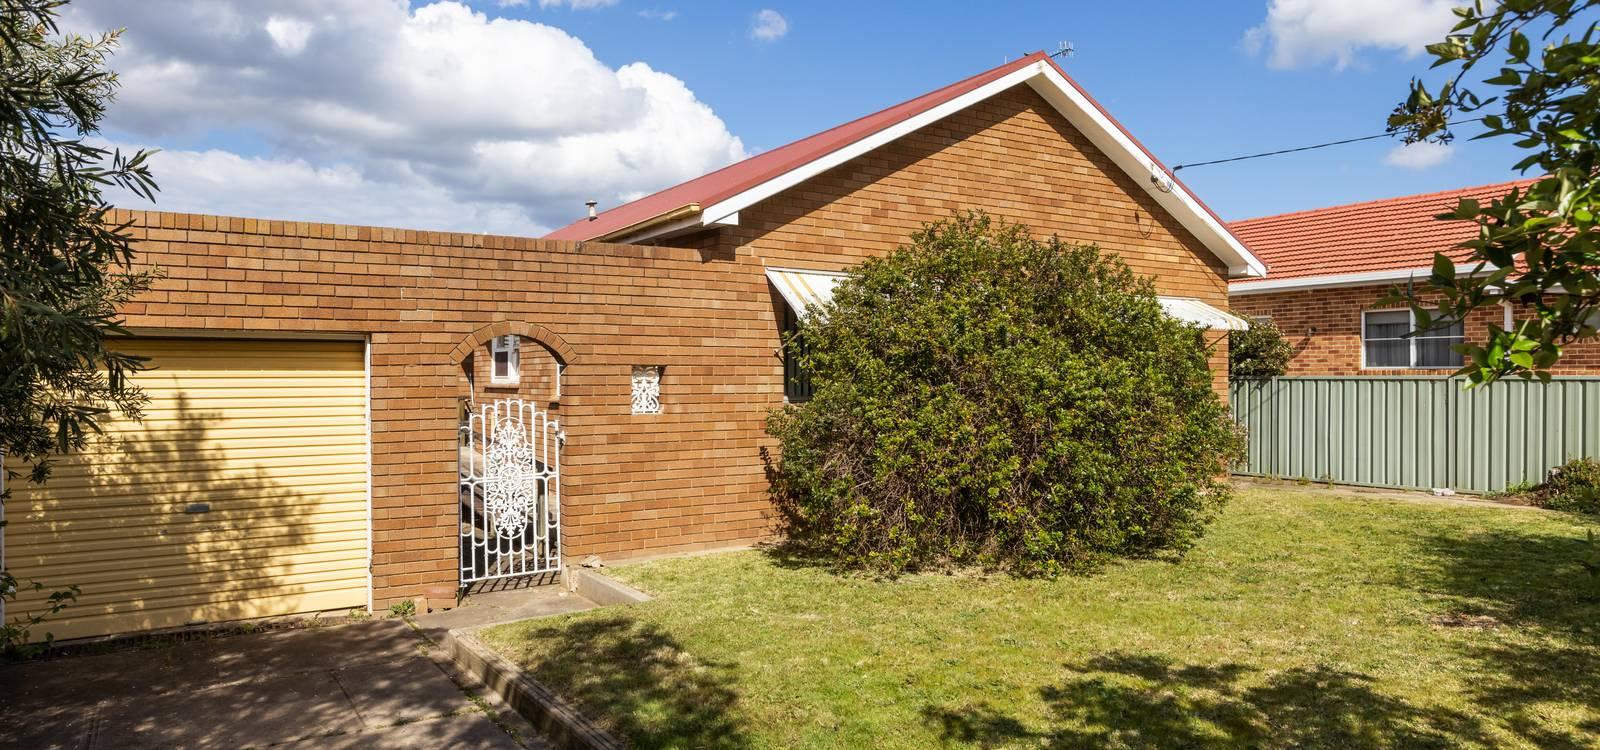 57 Prince Street GOULBURN, NSW 2580 - photo 1